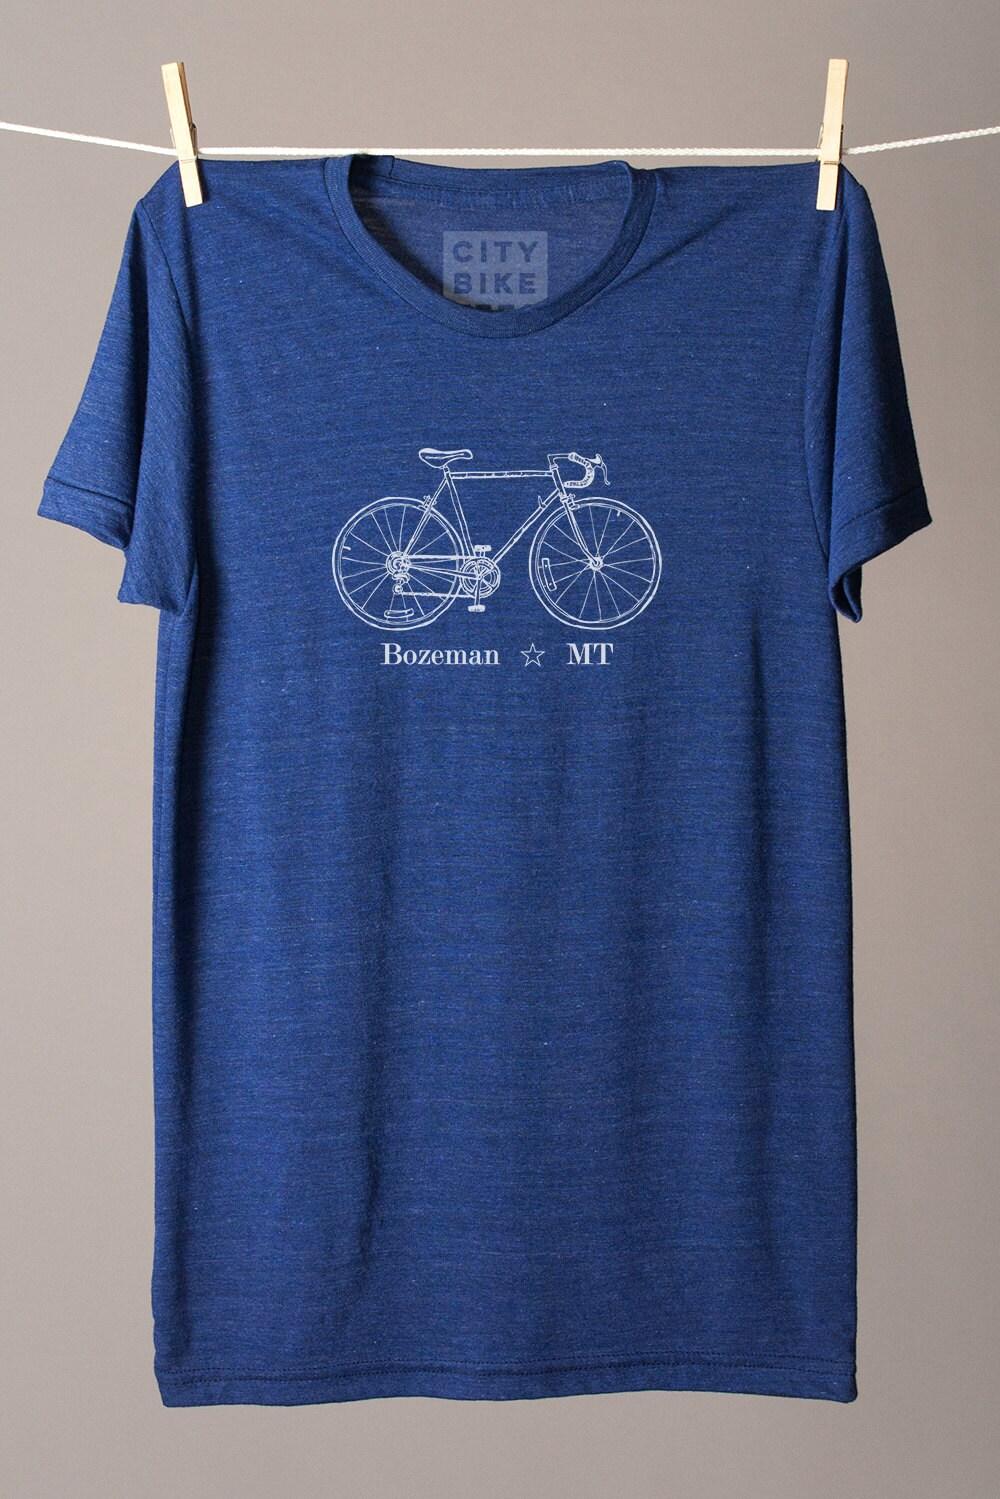 Bozeman Montana Tshirt Bozeman Tshirt Cycling Tee City Bike